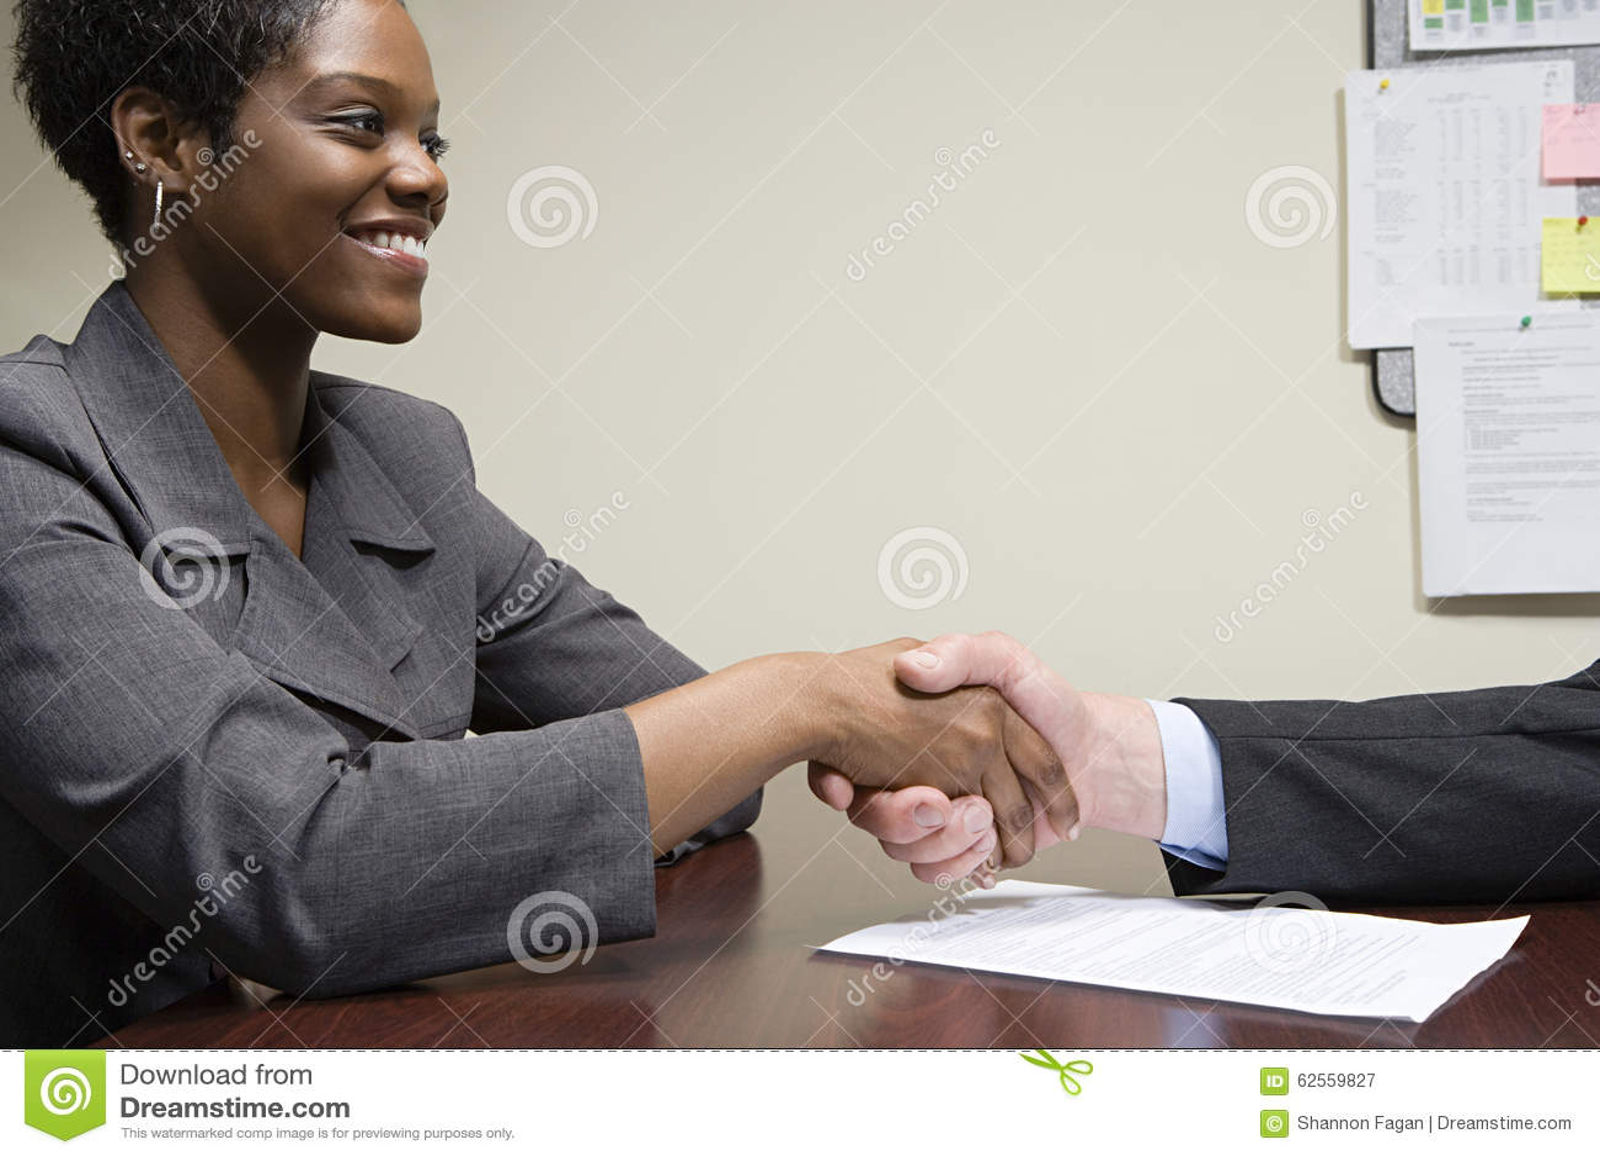 interviewee and interviewer shaking hands stock photo image interviewee and interviewer shaking hands